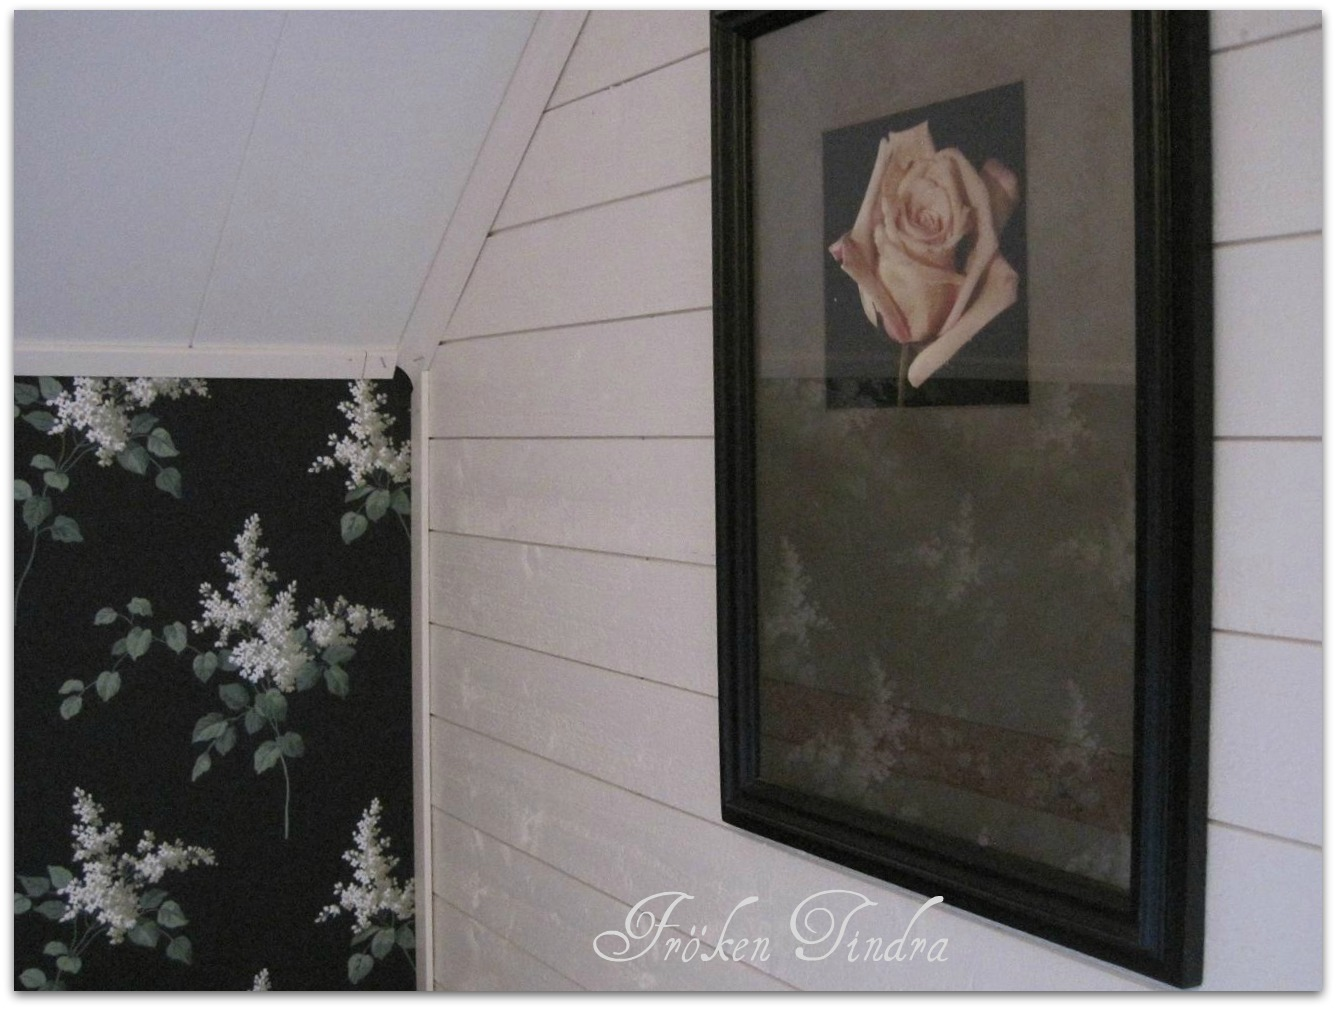 Rosor & kaprifol: sovrummet igen...